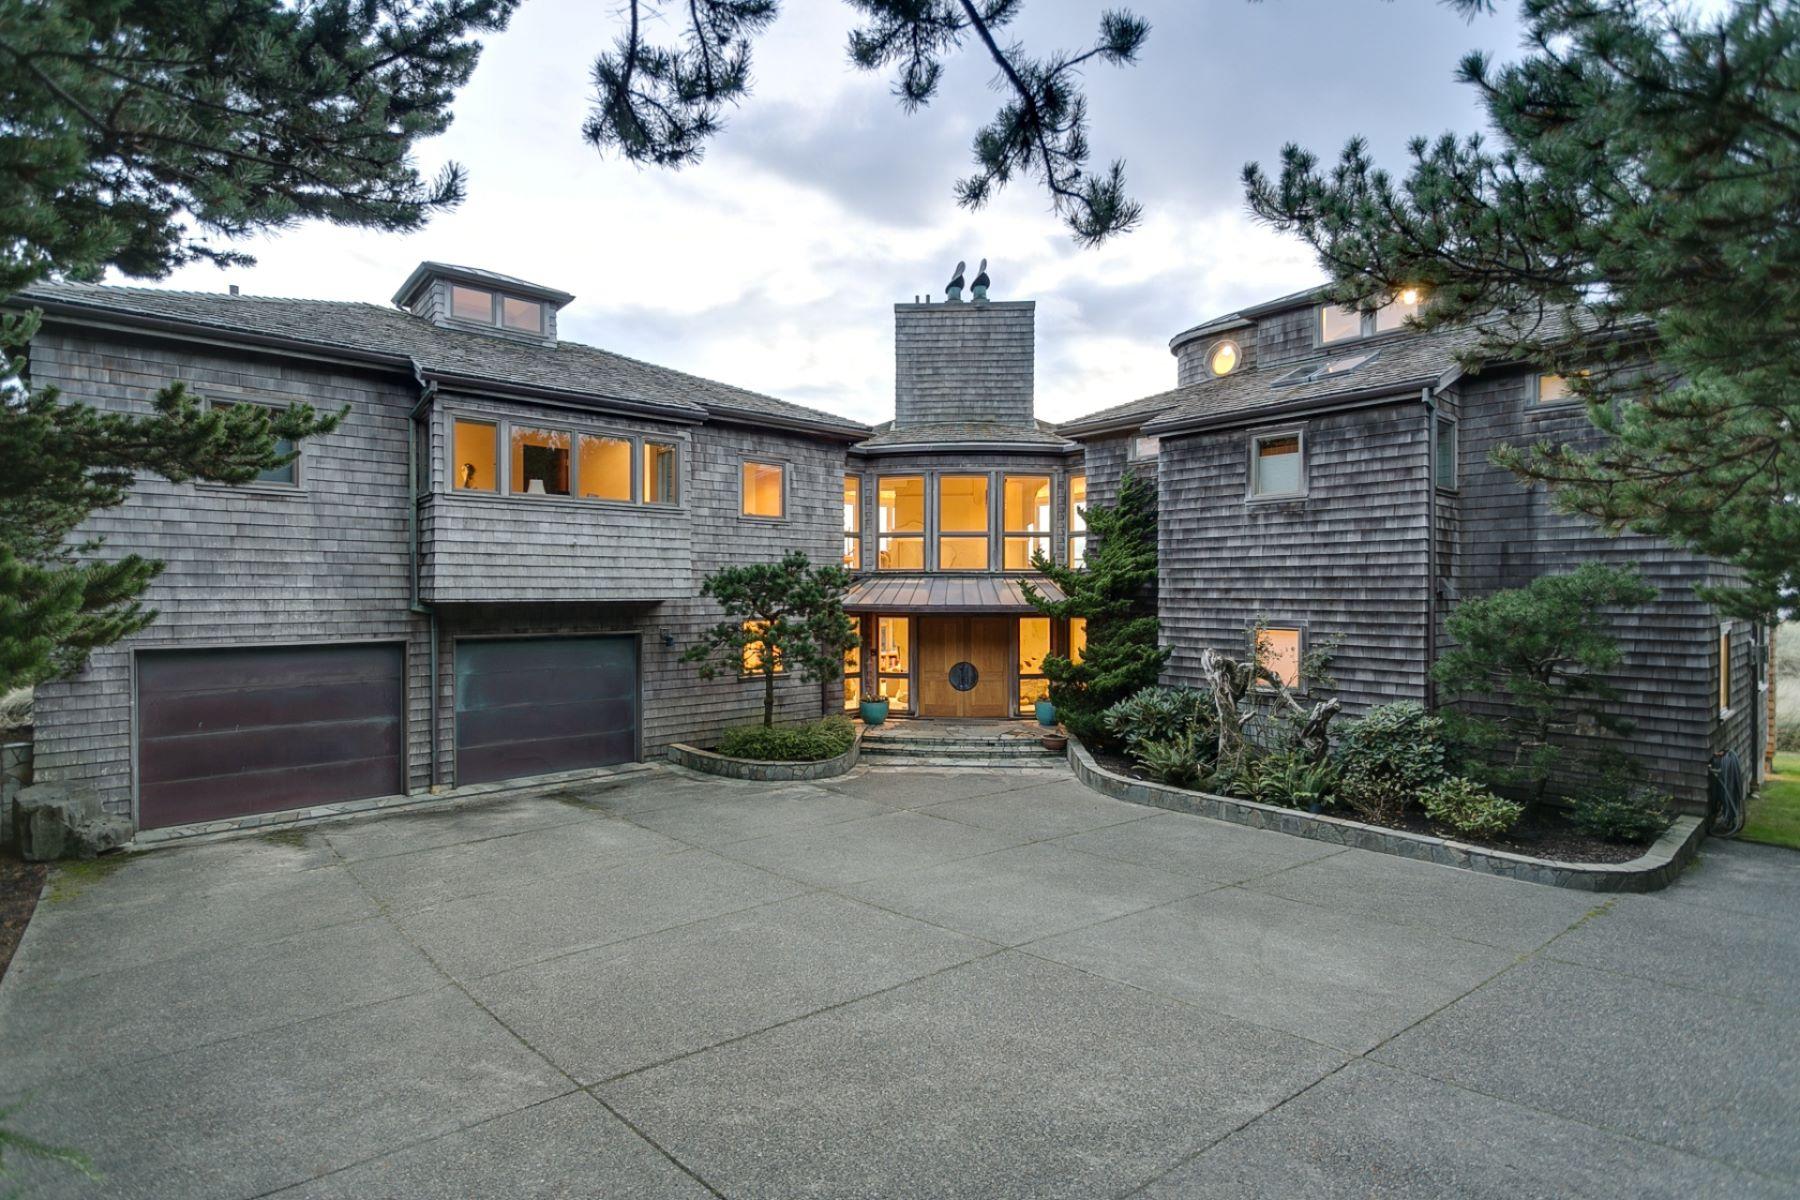 Other Residential Homes για την Πώληση στο 640 N Oak St Cannon Beach, OR 97110 Cannon Beach, Ορεγκον 97110 Ηνωμένες Πολιτείες